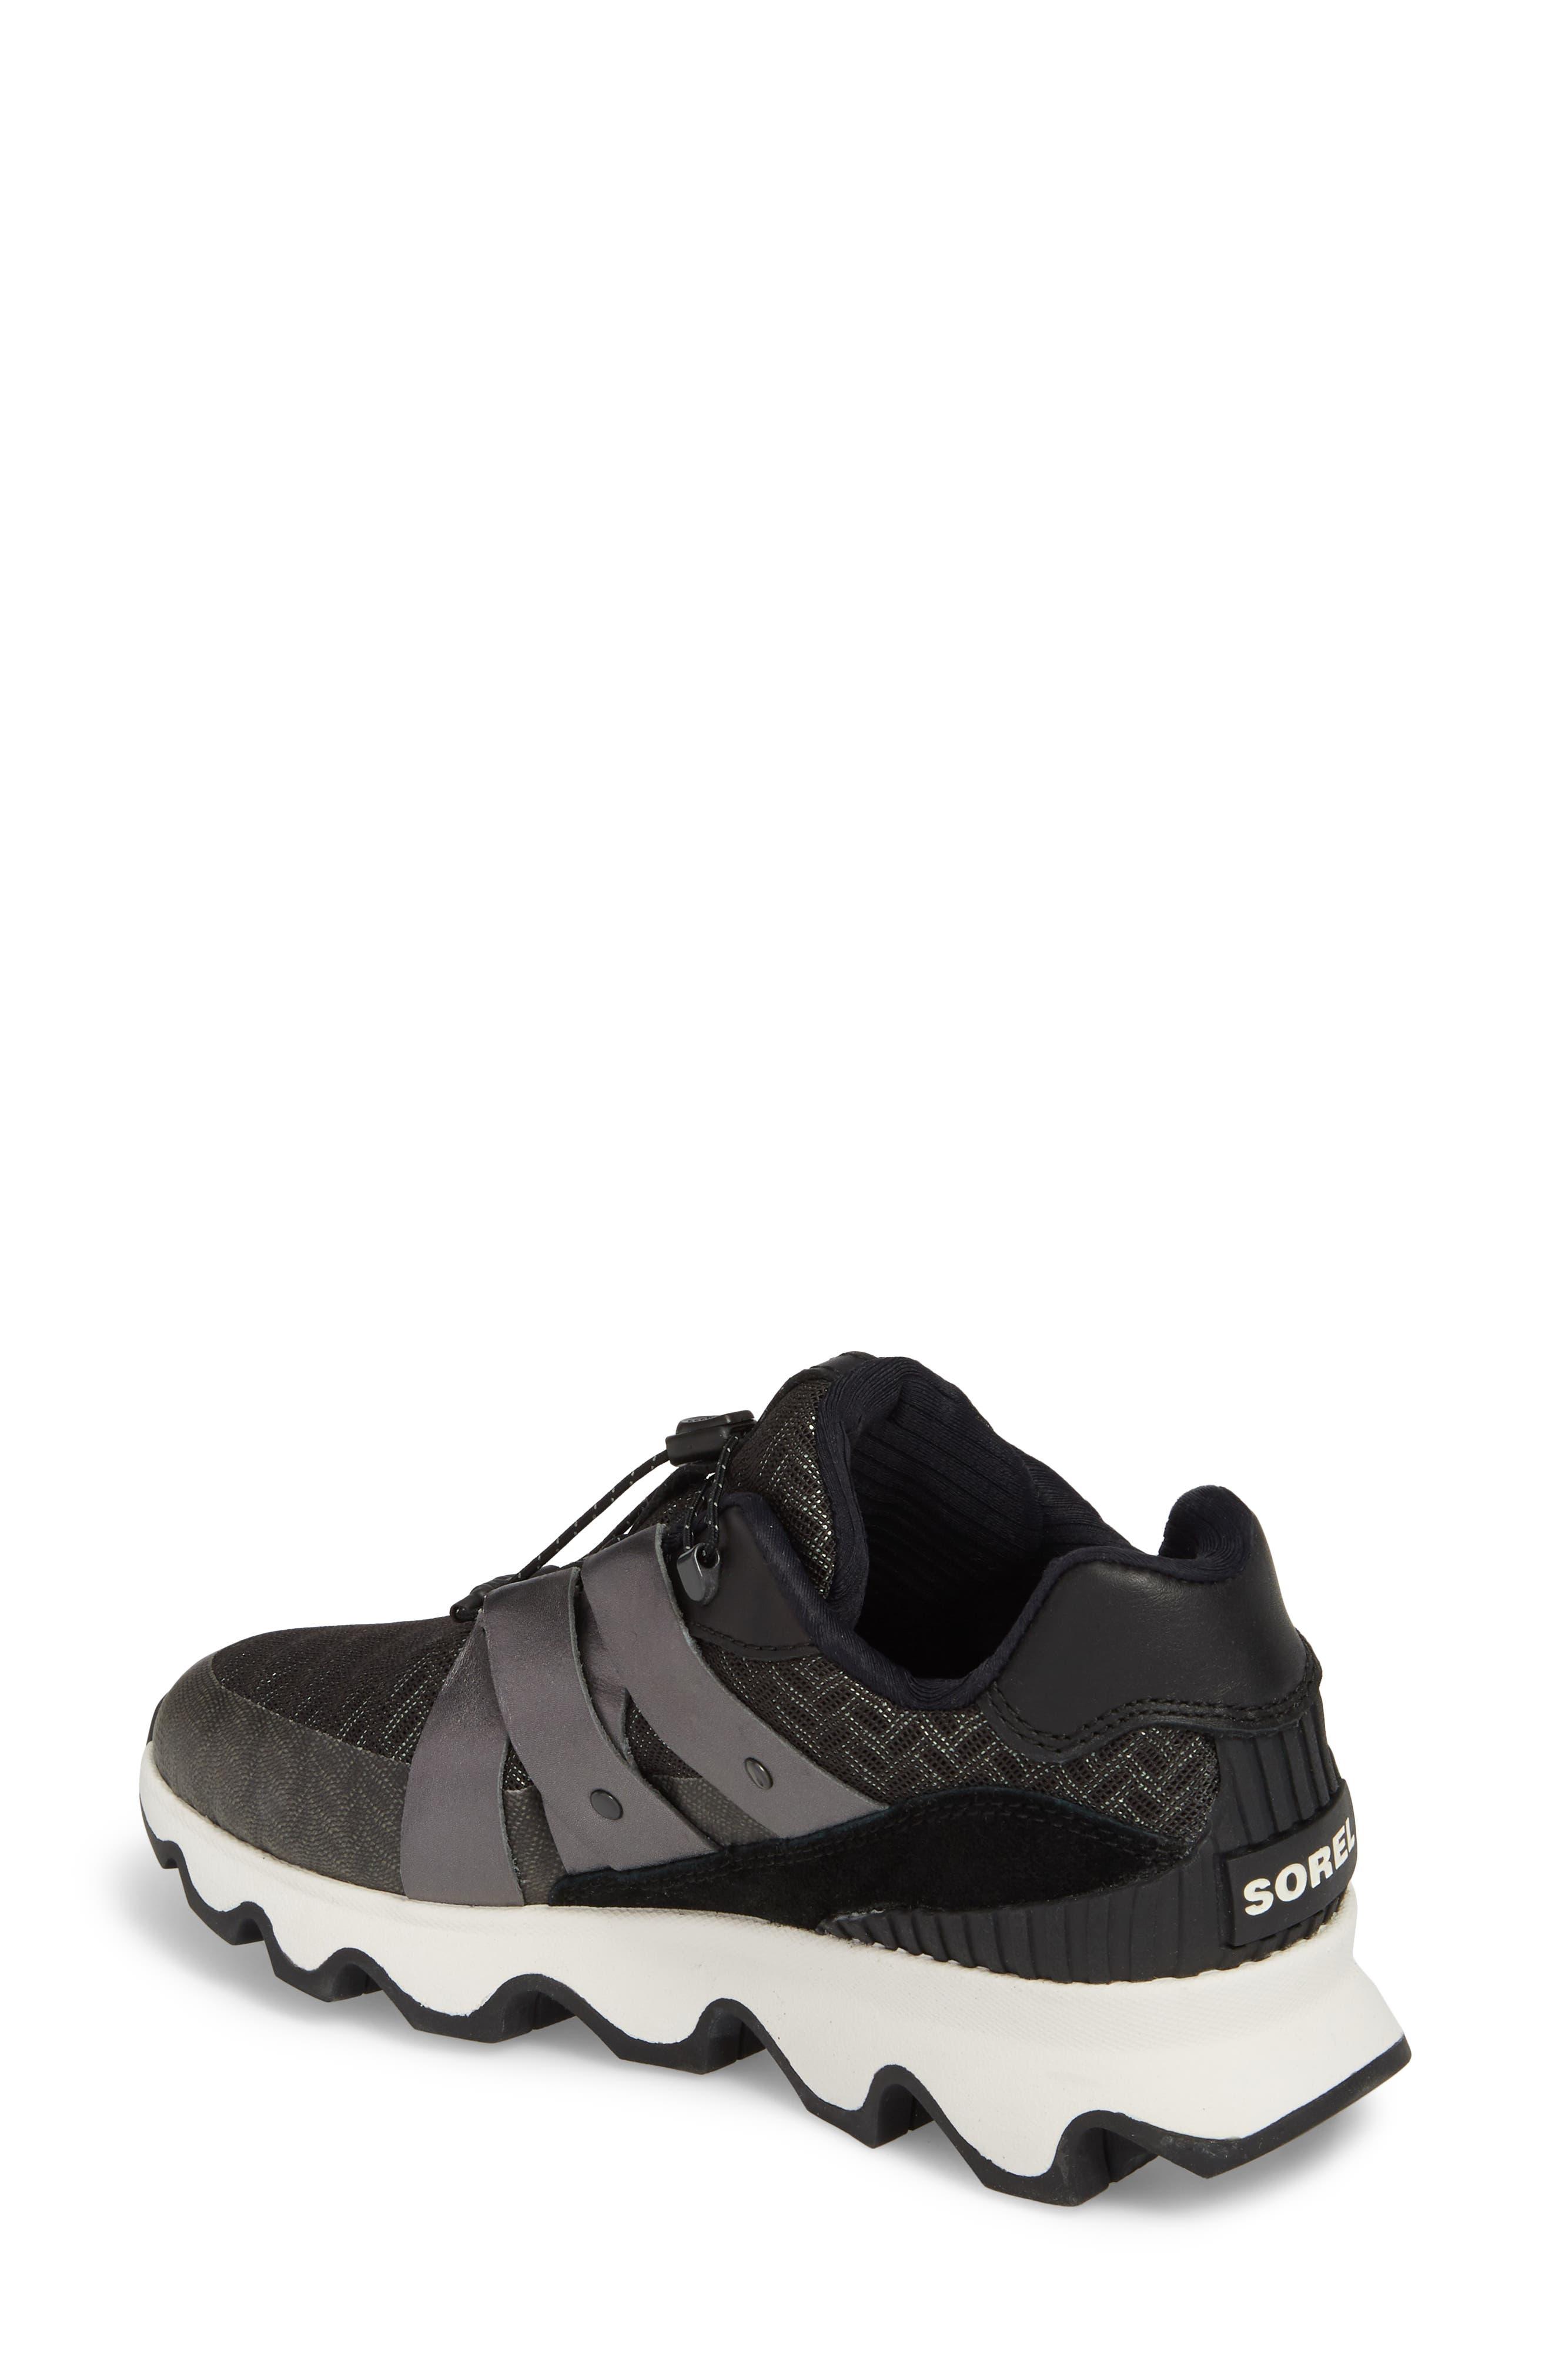 Kinetic Speed Sneaker,                             Alternate thumbnail 2, color,                             010